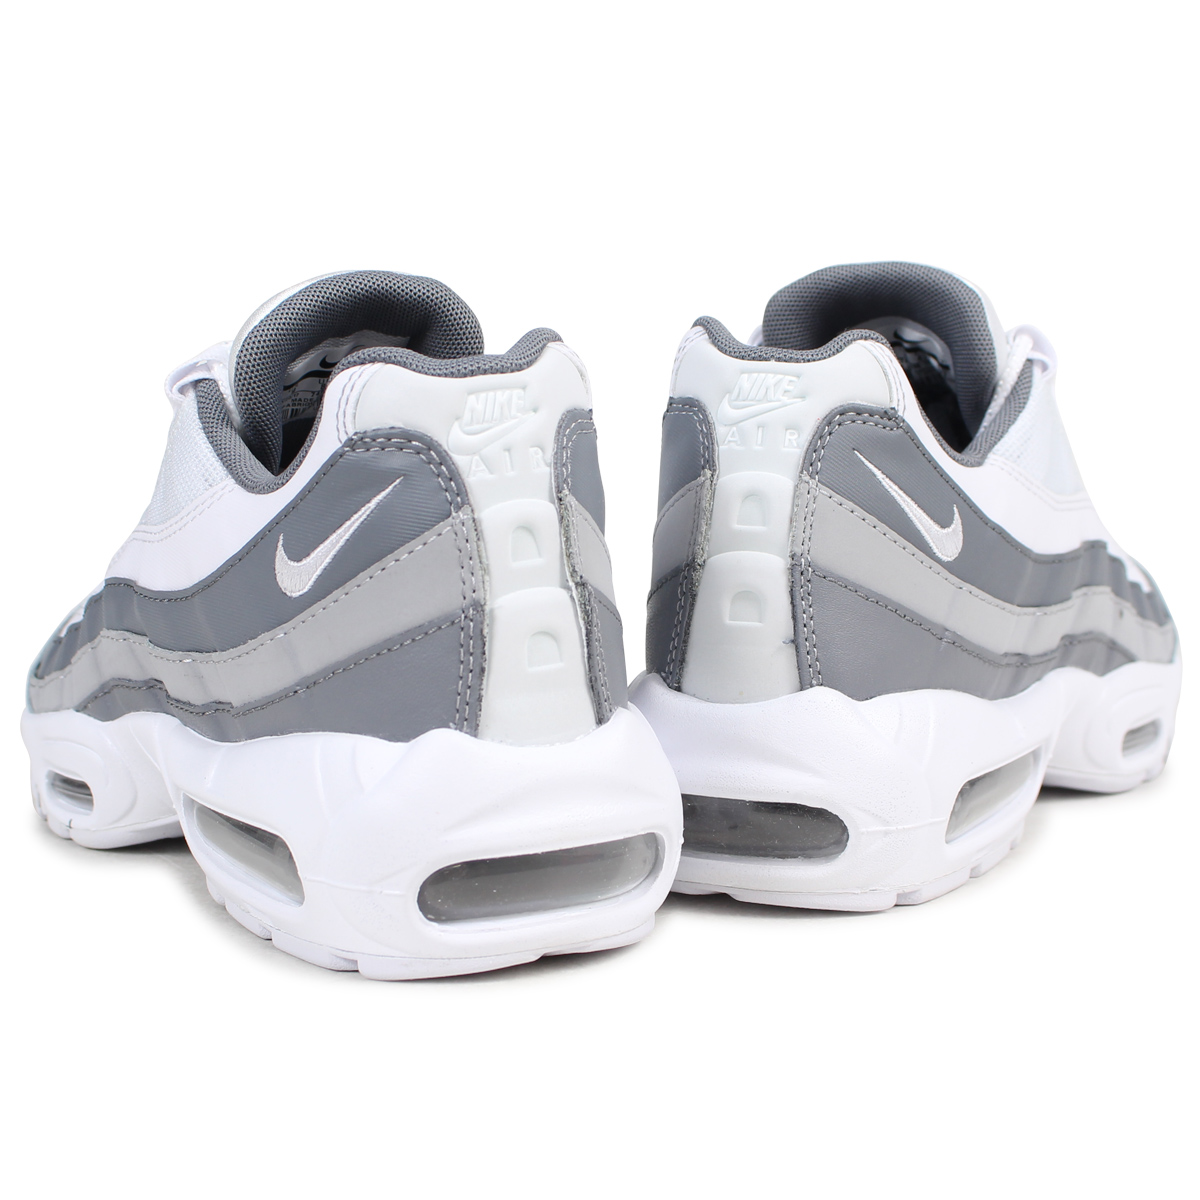 NIKE AIR MAX 95 ESSENTIAL Kie Ney AMAX 95 sneakers men 749,766 105 white [186]